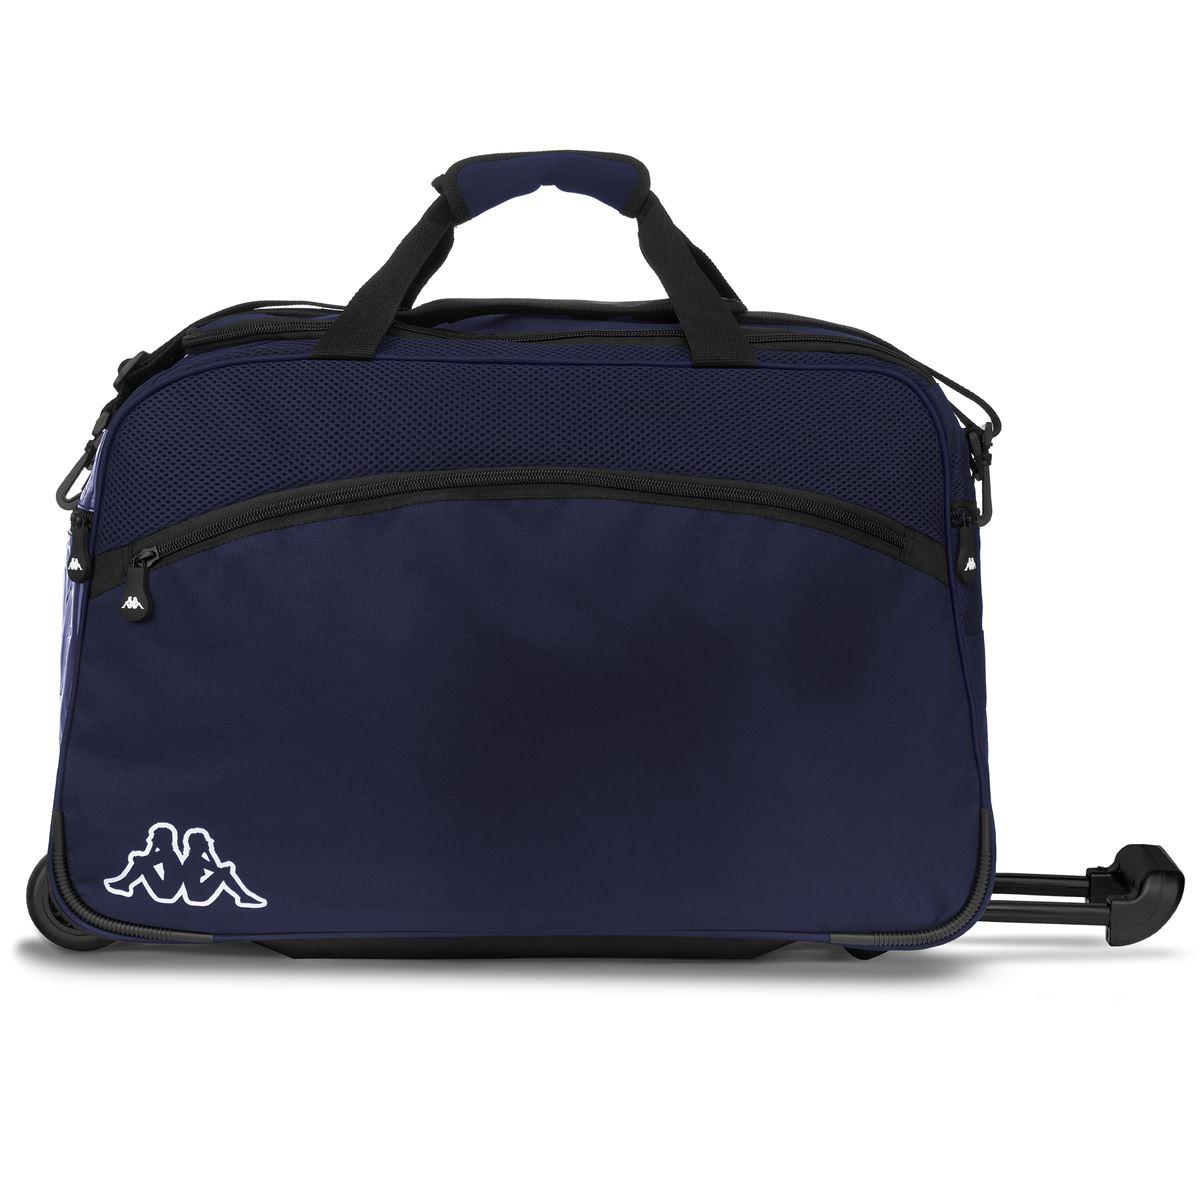 Kappa Trolley Bag Travel Man Woman